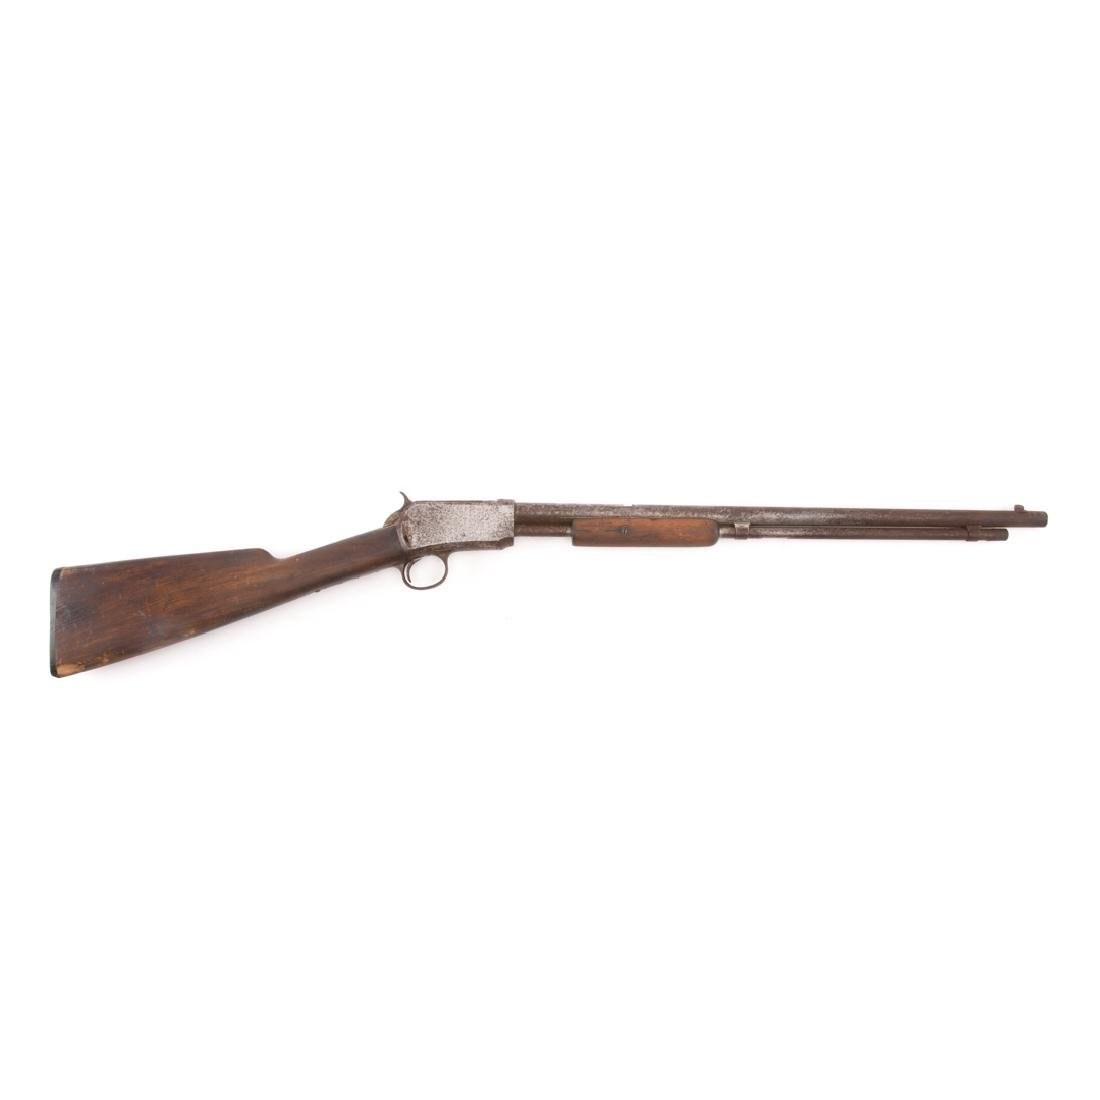 Winchester single shot 22 caliber